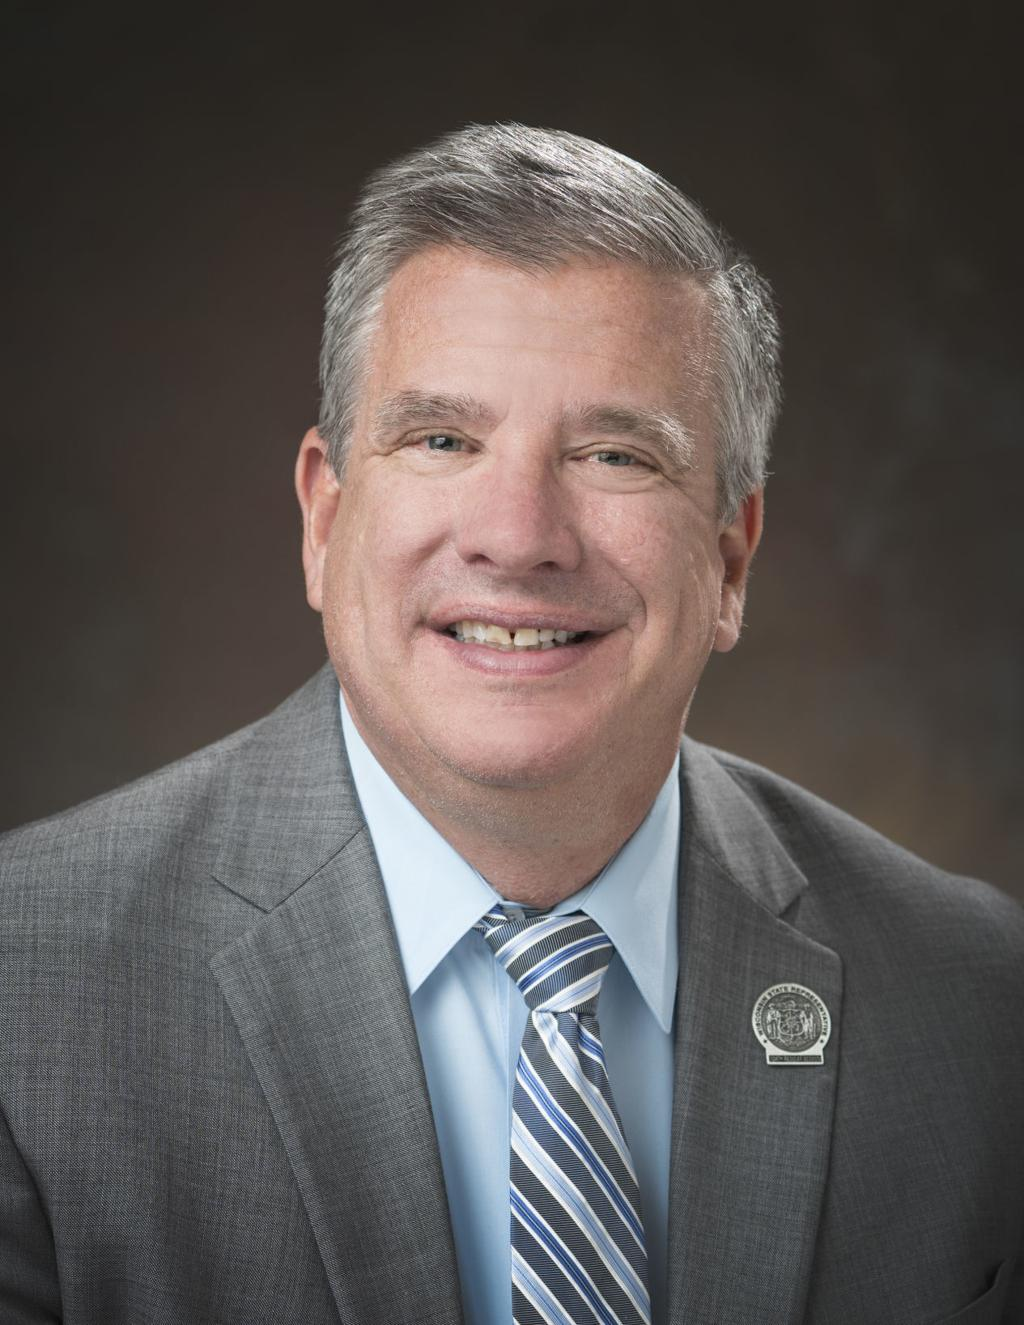 Rep  John Nygren: Let's keep Wisconsin the land of opportunity